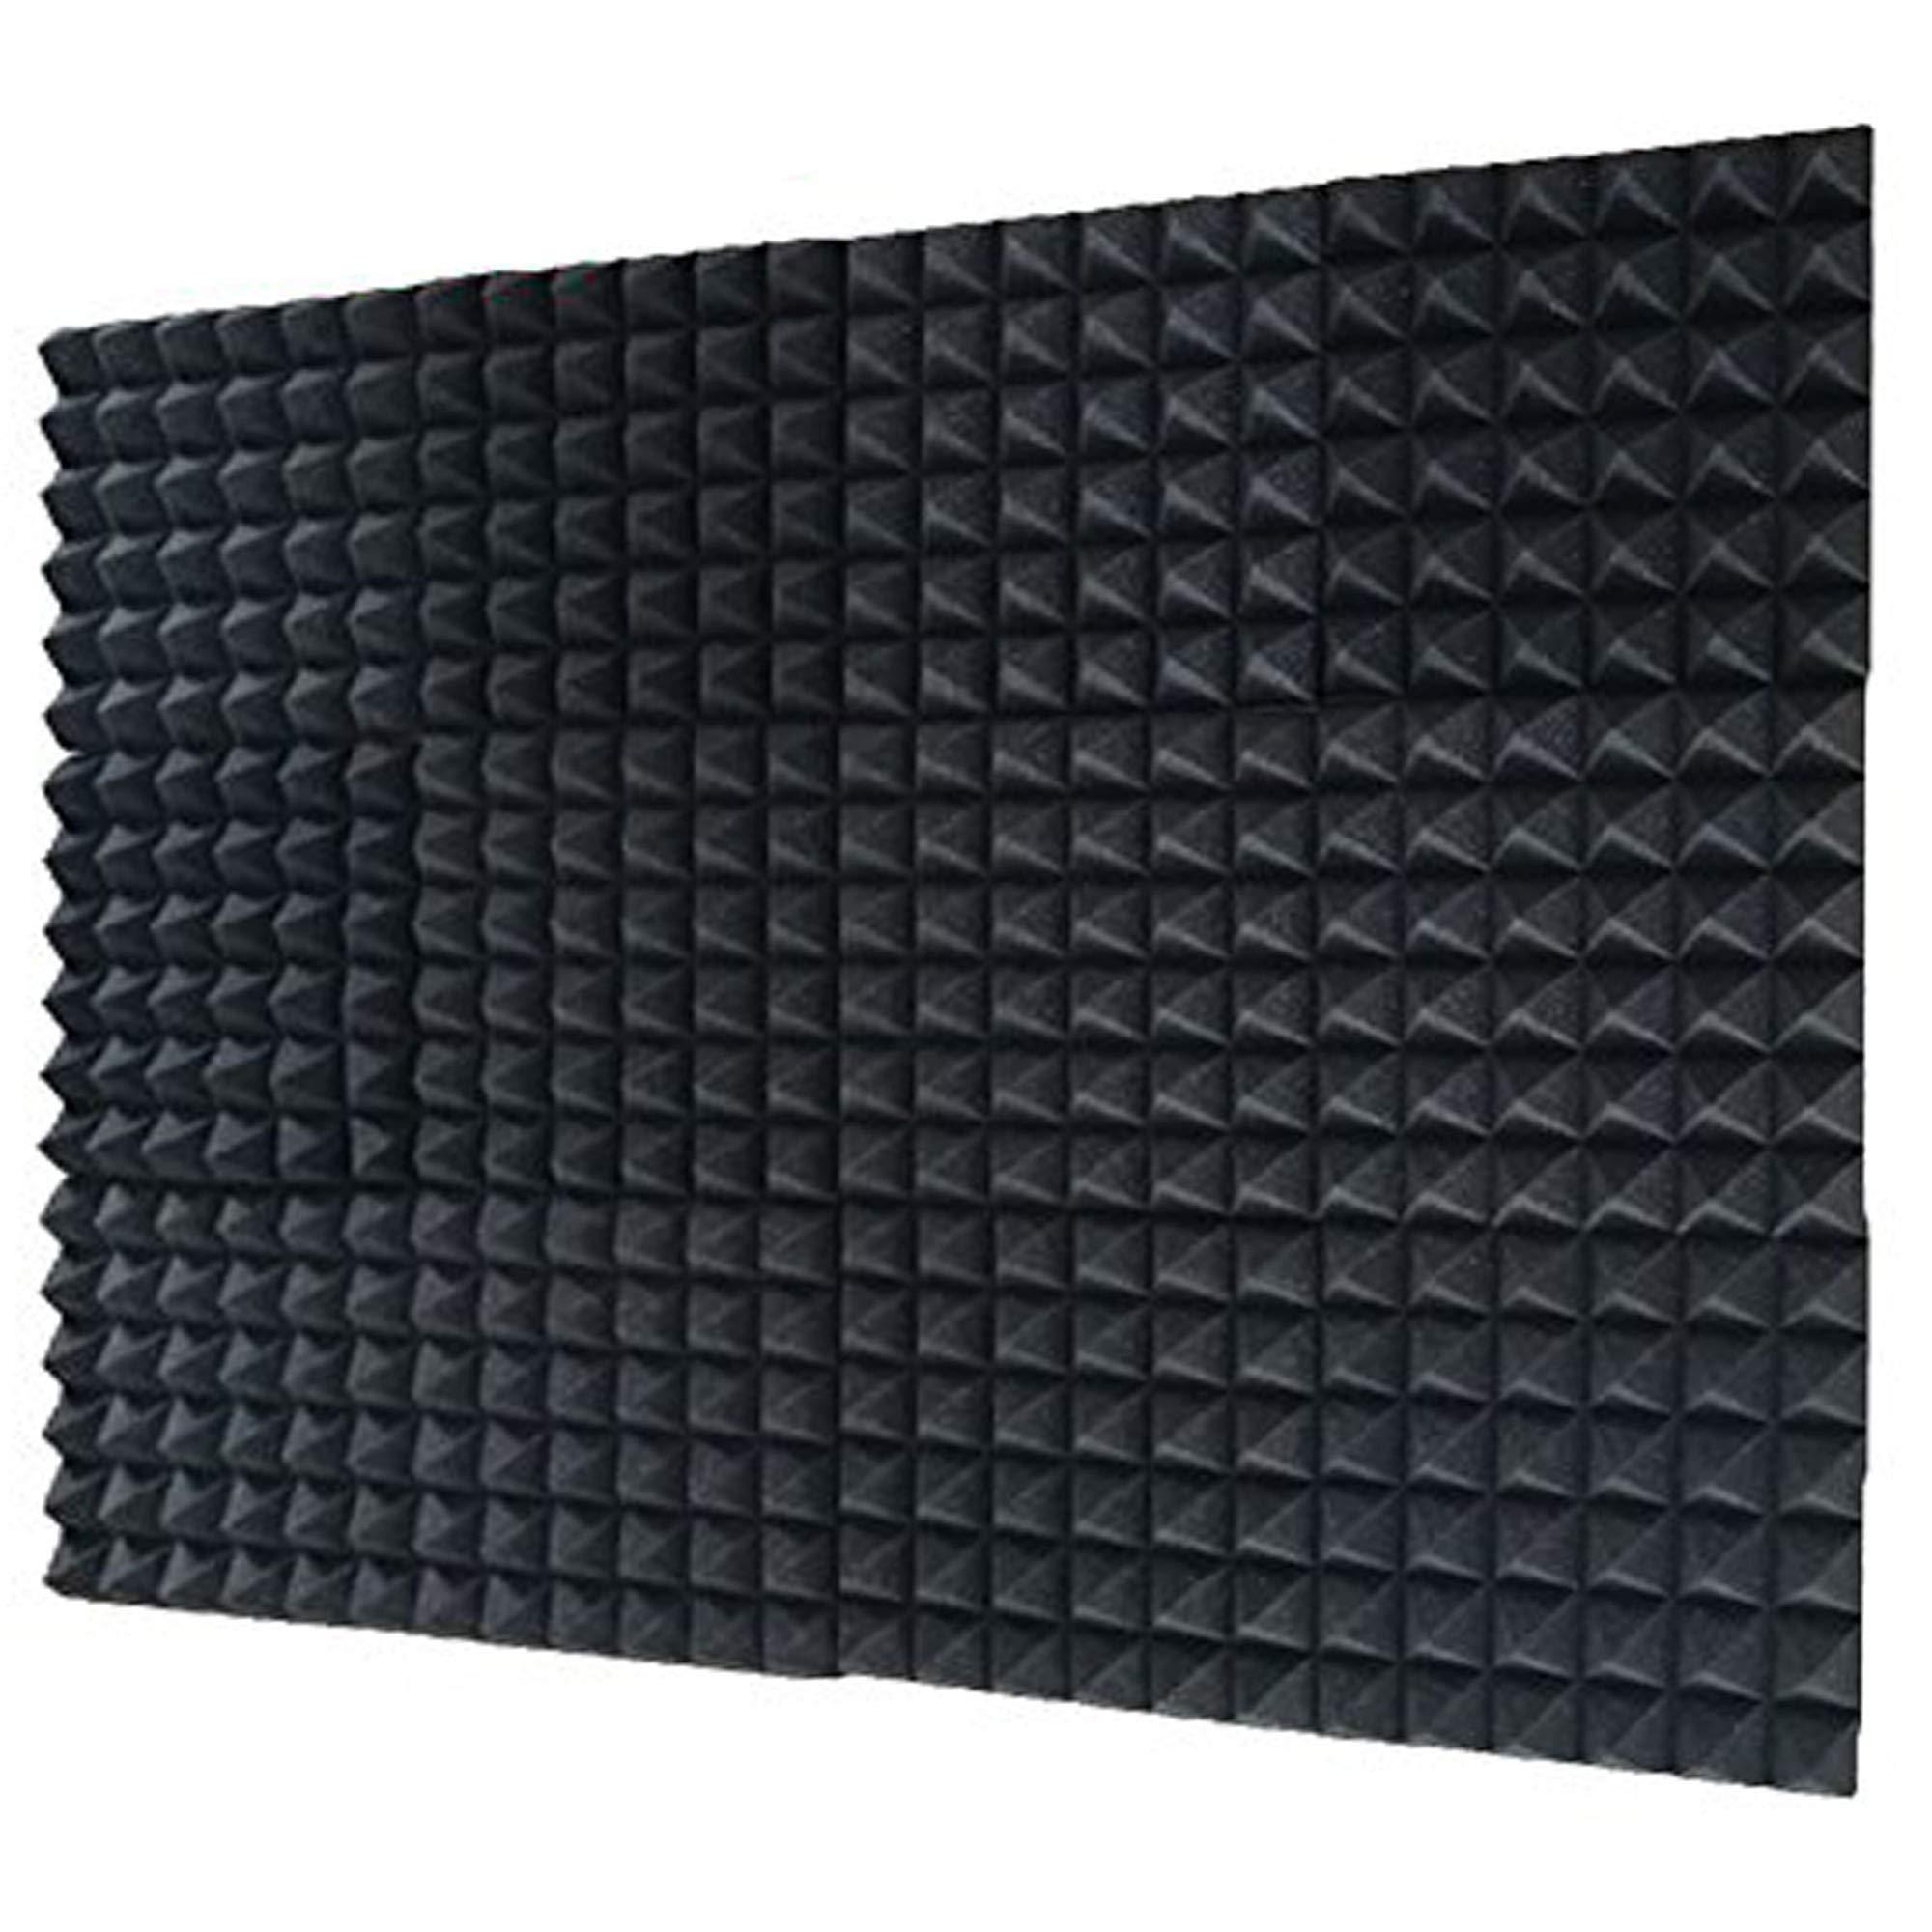 12 Pack Set Acoustic Foam Panels, Studio Wedge Tiles, 2'' X 12'' X 12'' Acoustic Foam Sound Absorption Pyramid Studio Treatment Wall Panels